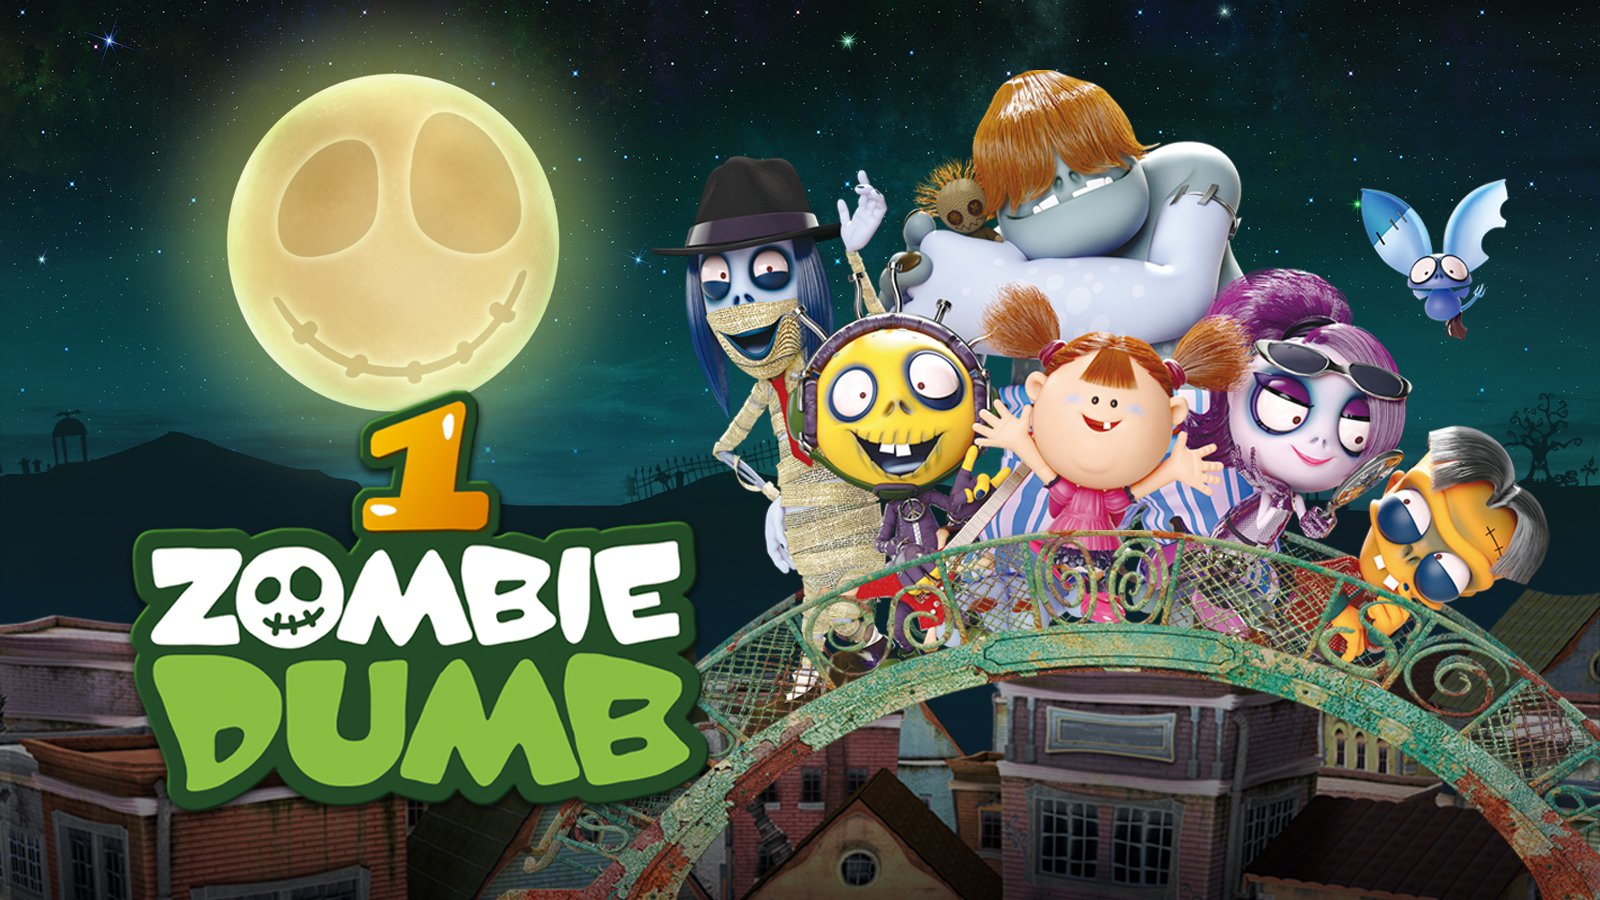 Zombiedumb Season 1 poster